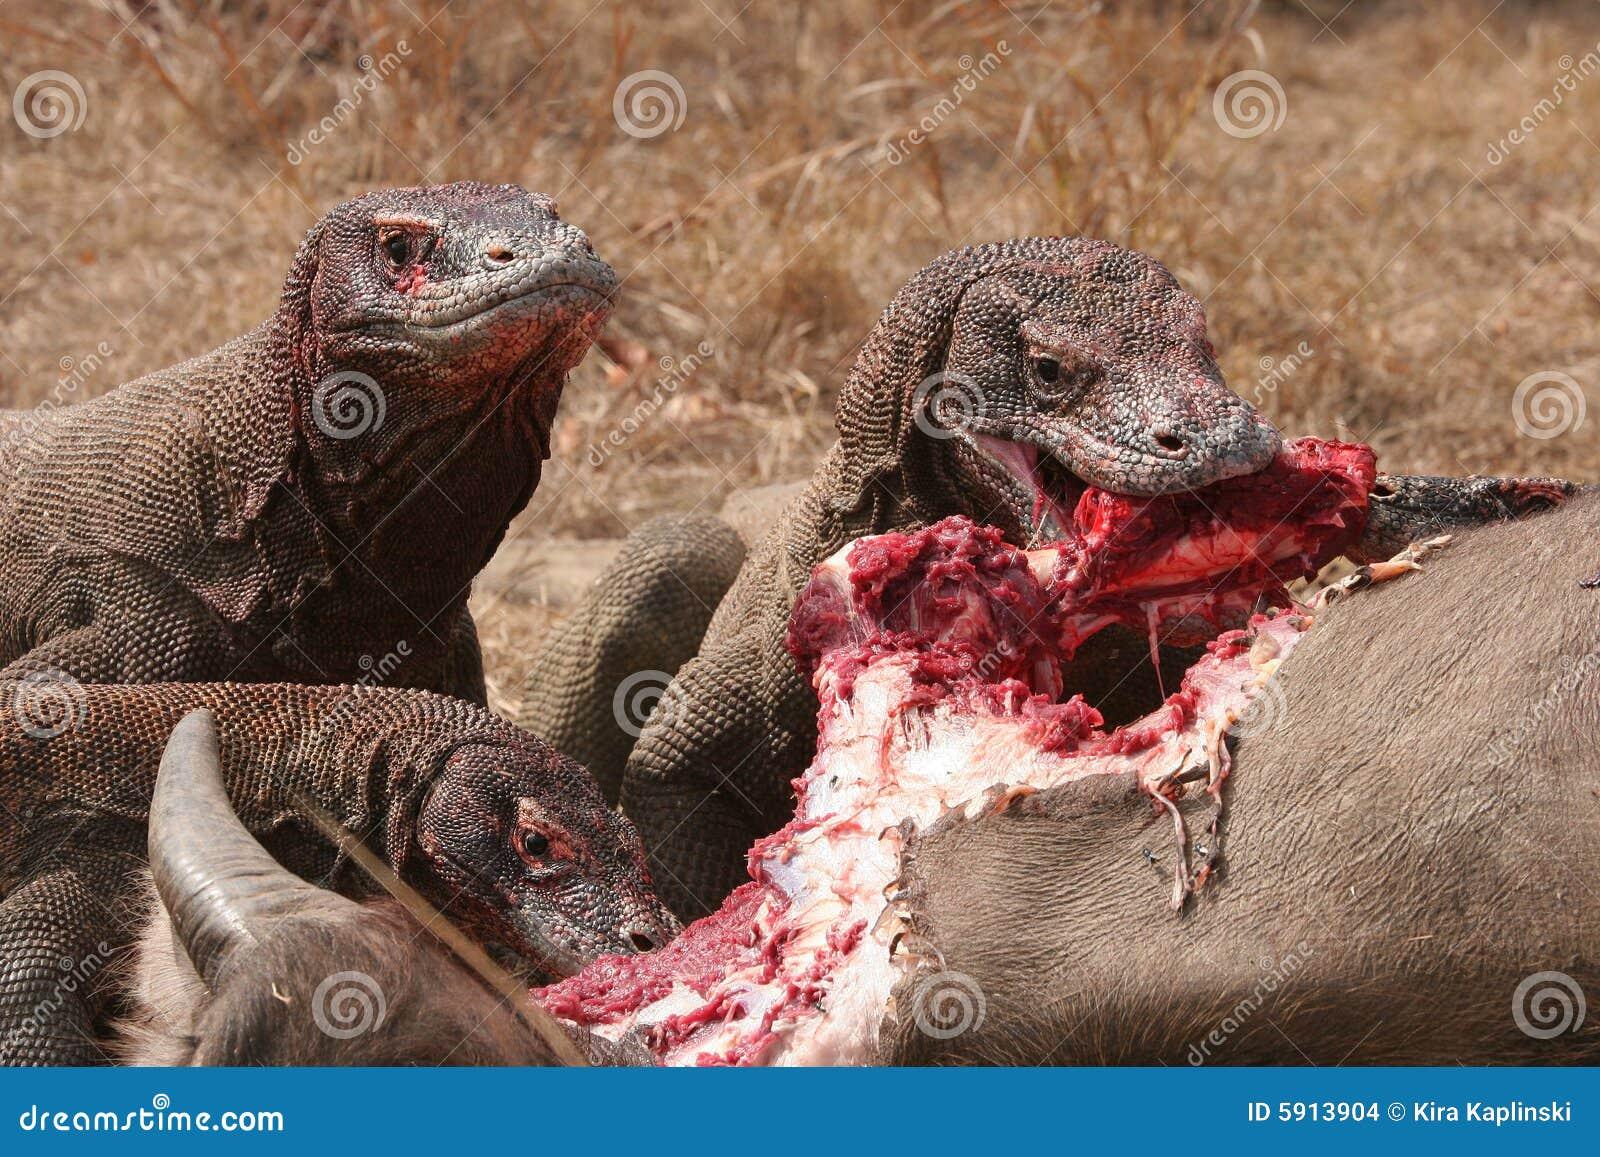 komodo dragons eating wild buffalo stock photo image of giant